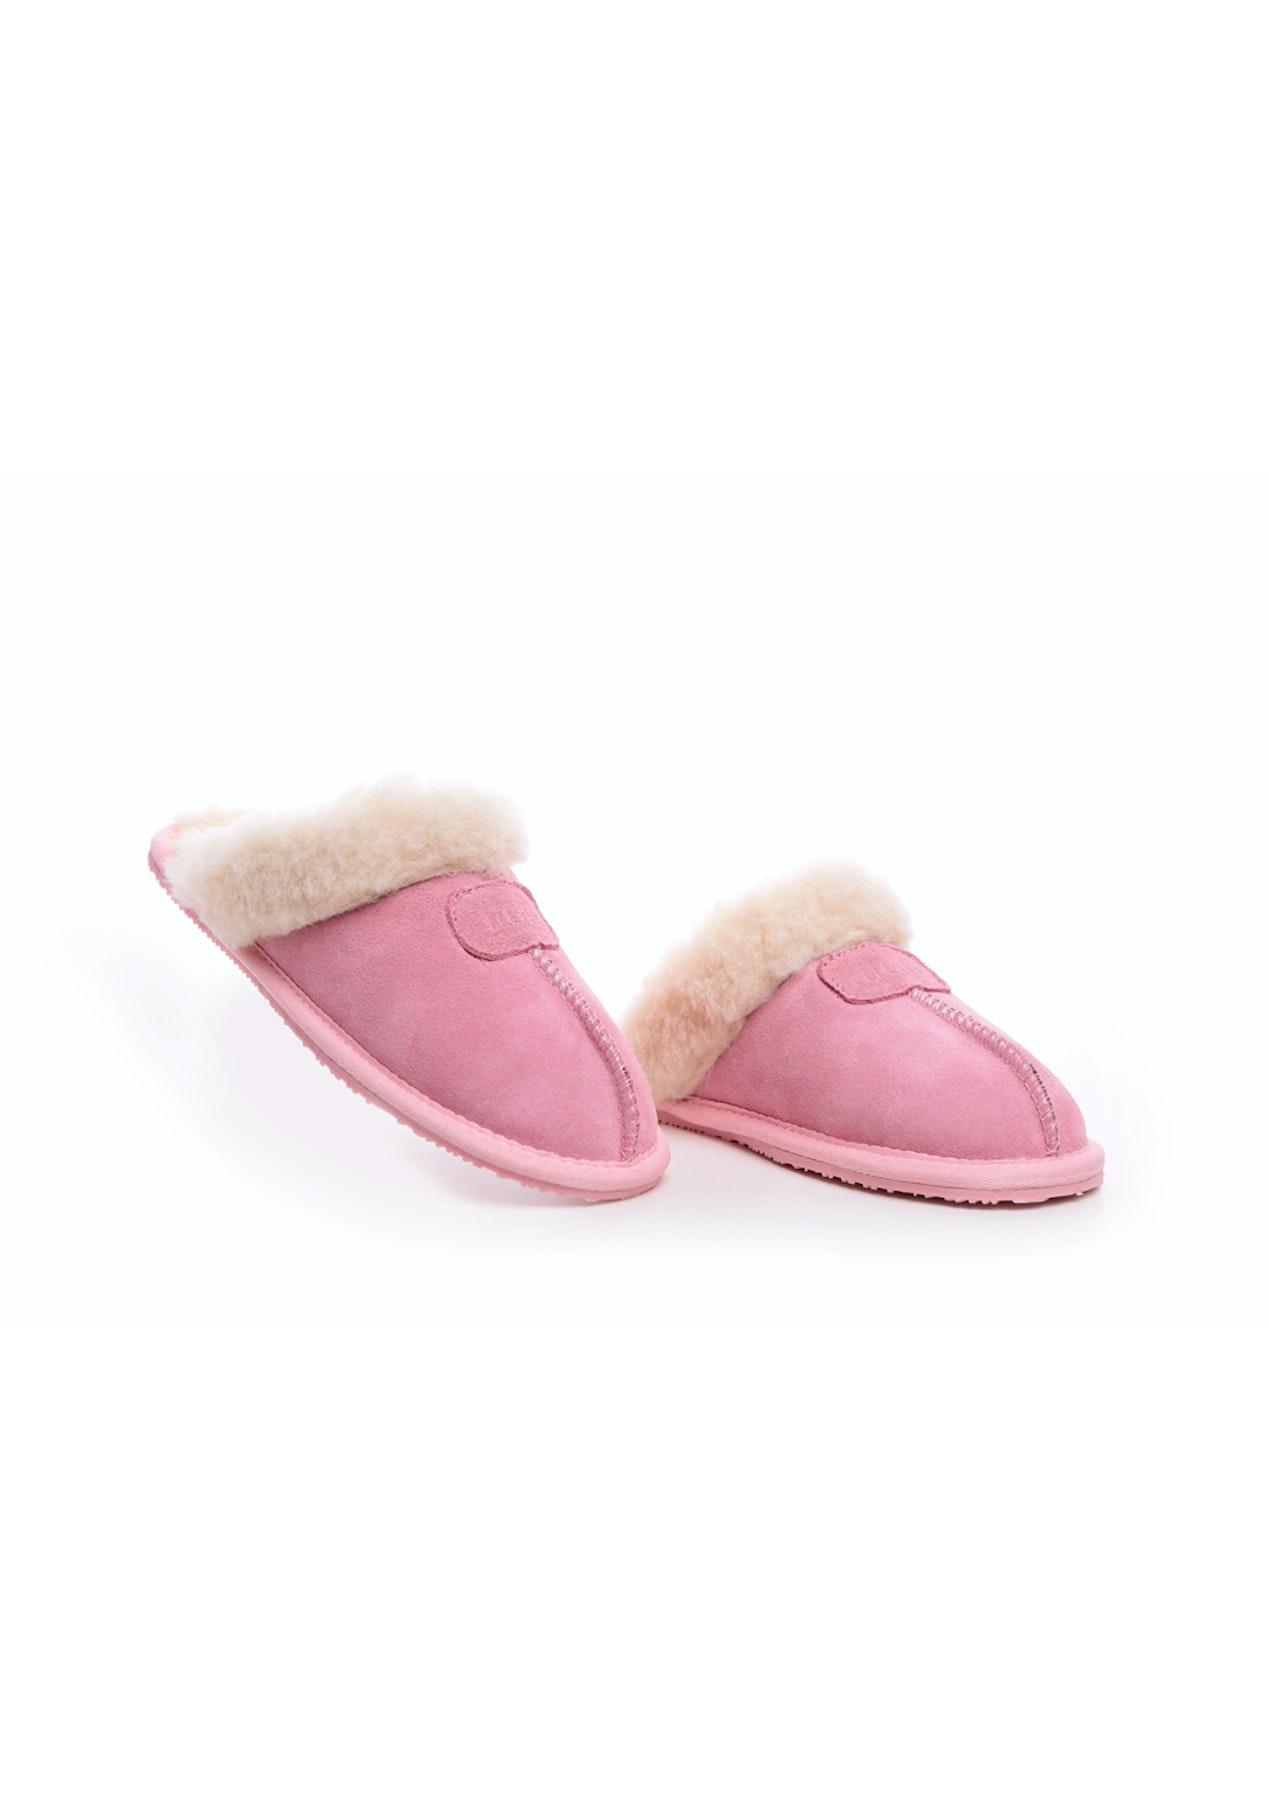 0b7cfafea5d Oz Natives UGG - Womens Classic Slipper - Pink